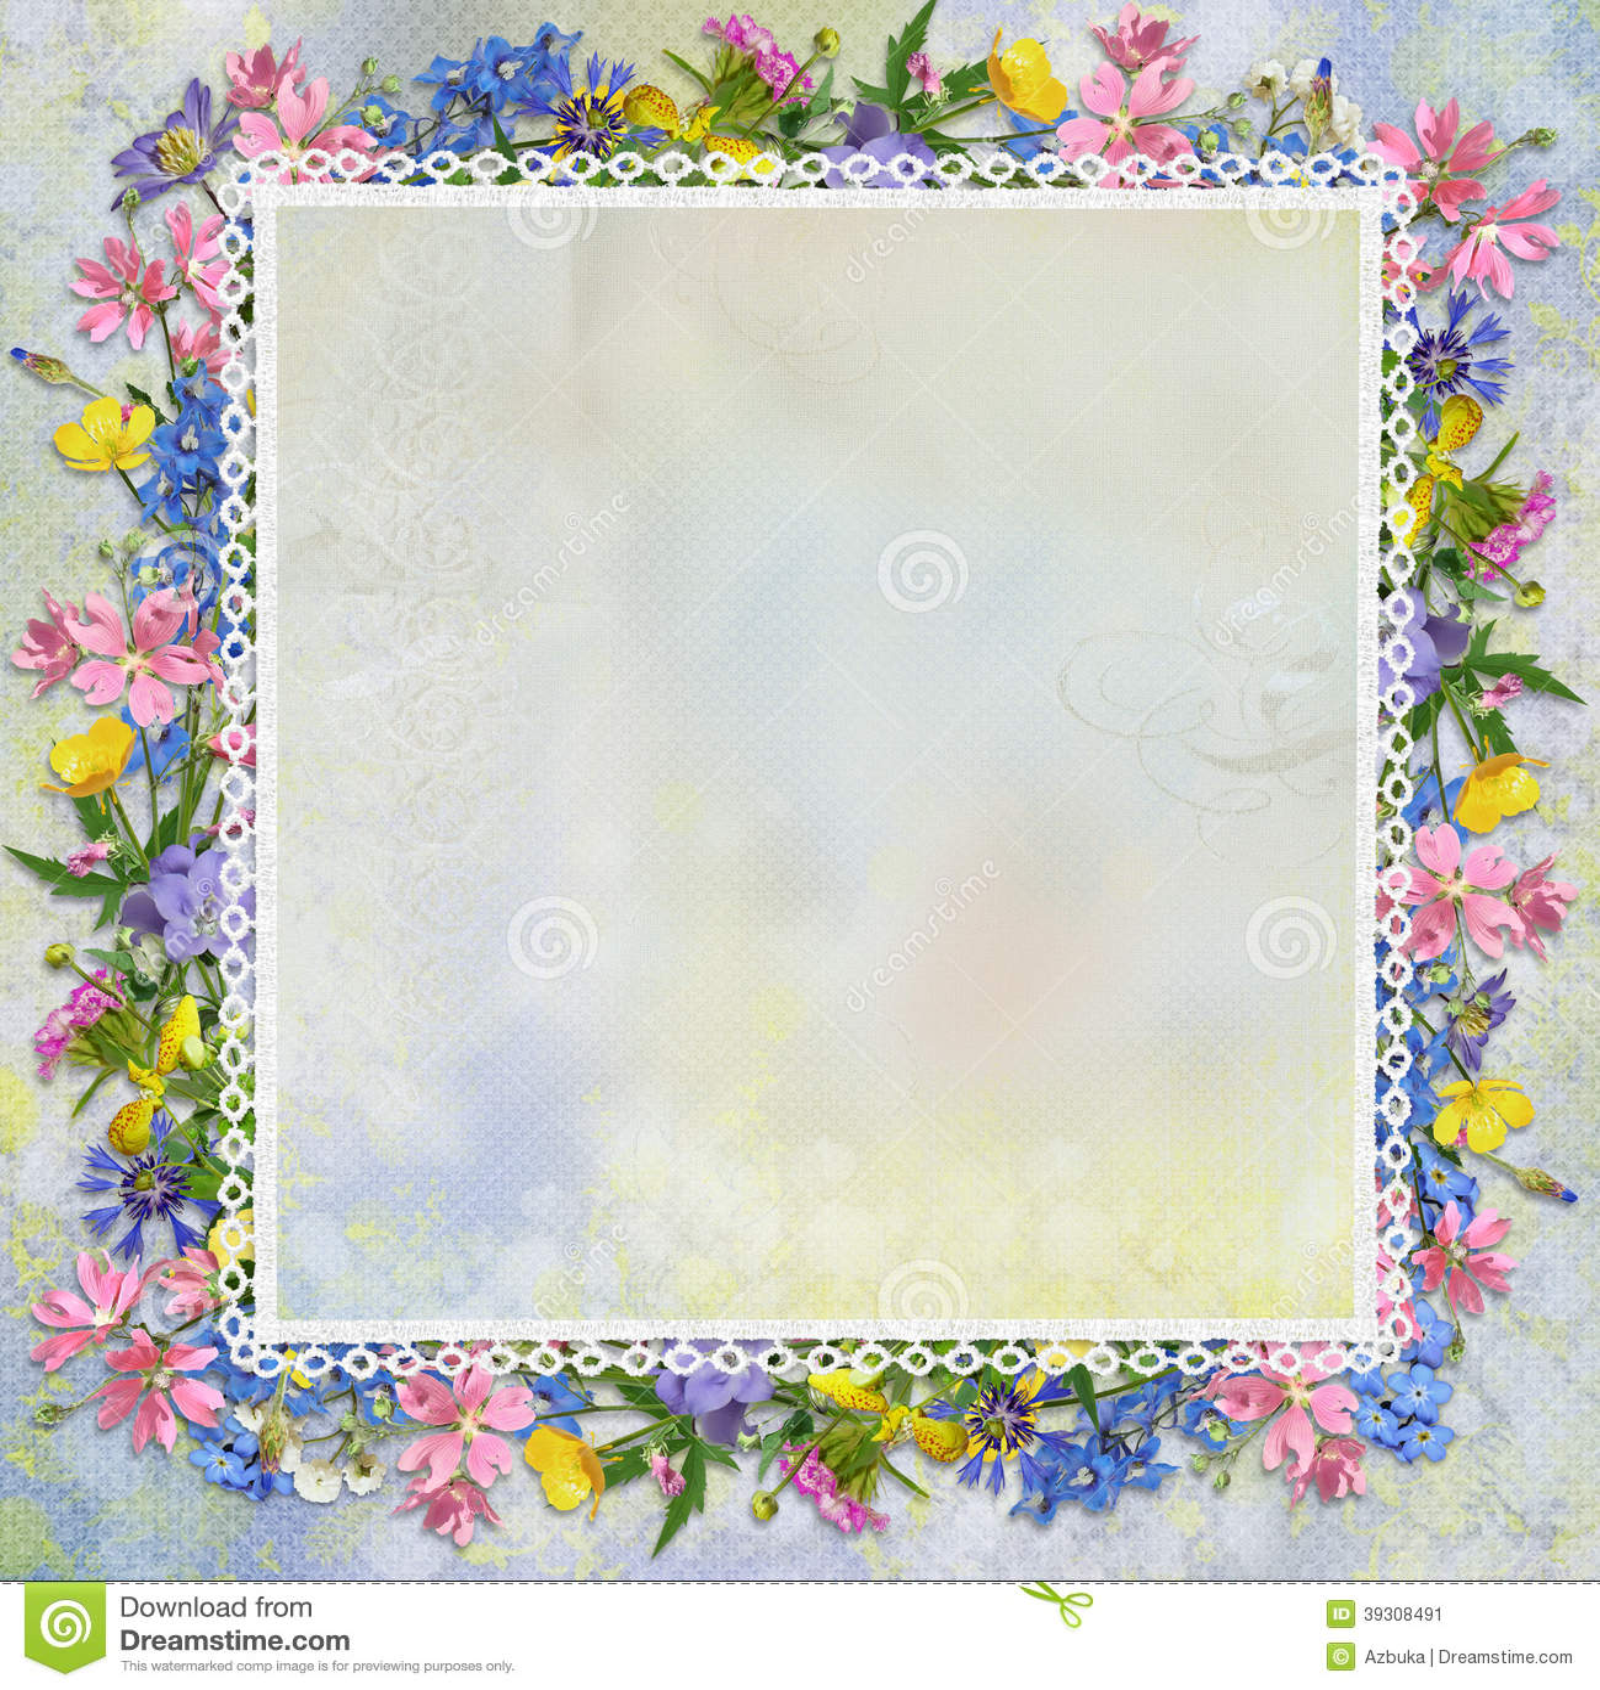 Border of flowers on a gentle background stock illustration border of flowers on a gentle background mightylinksfo